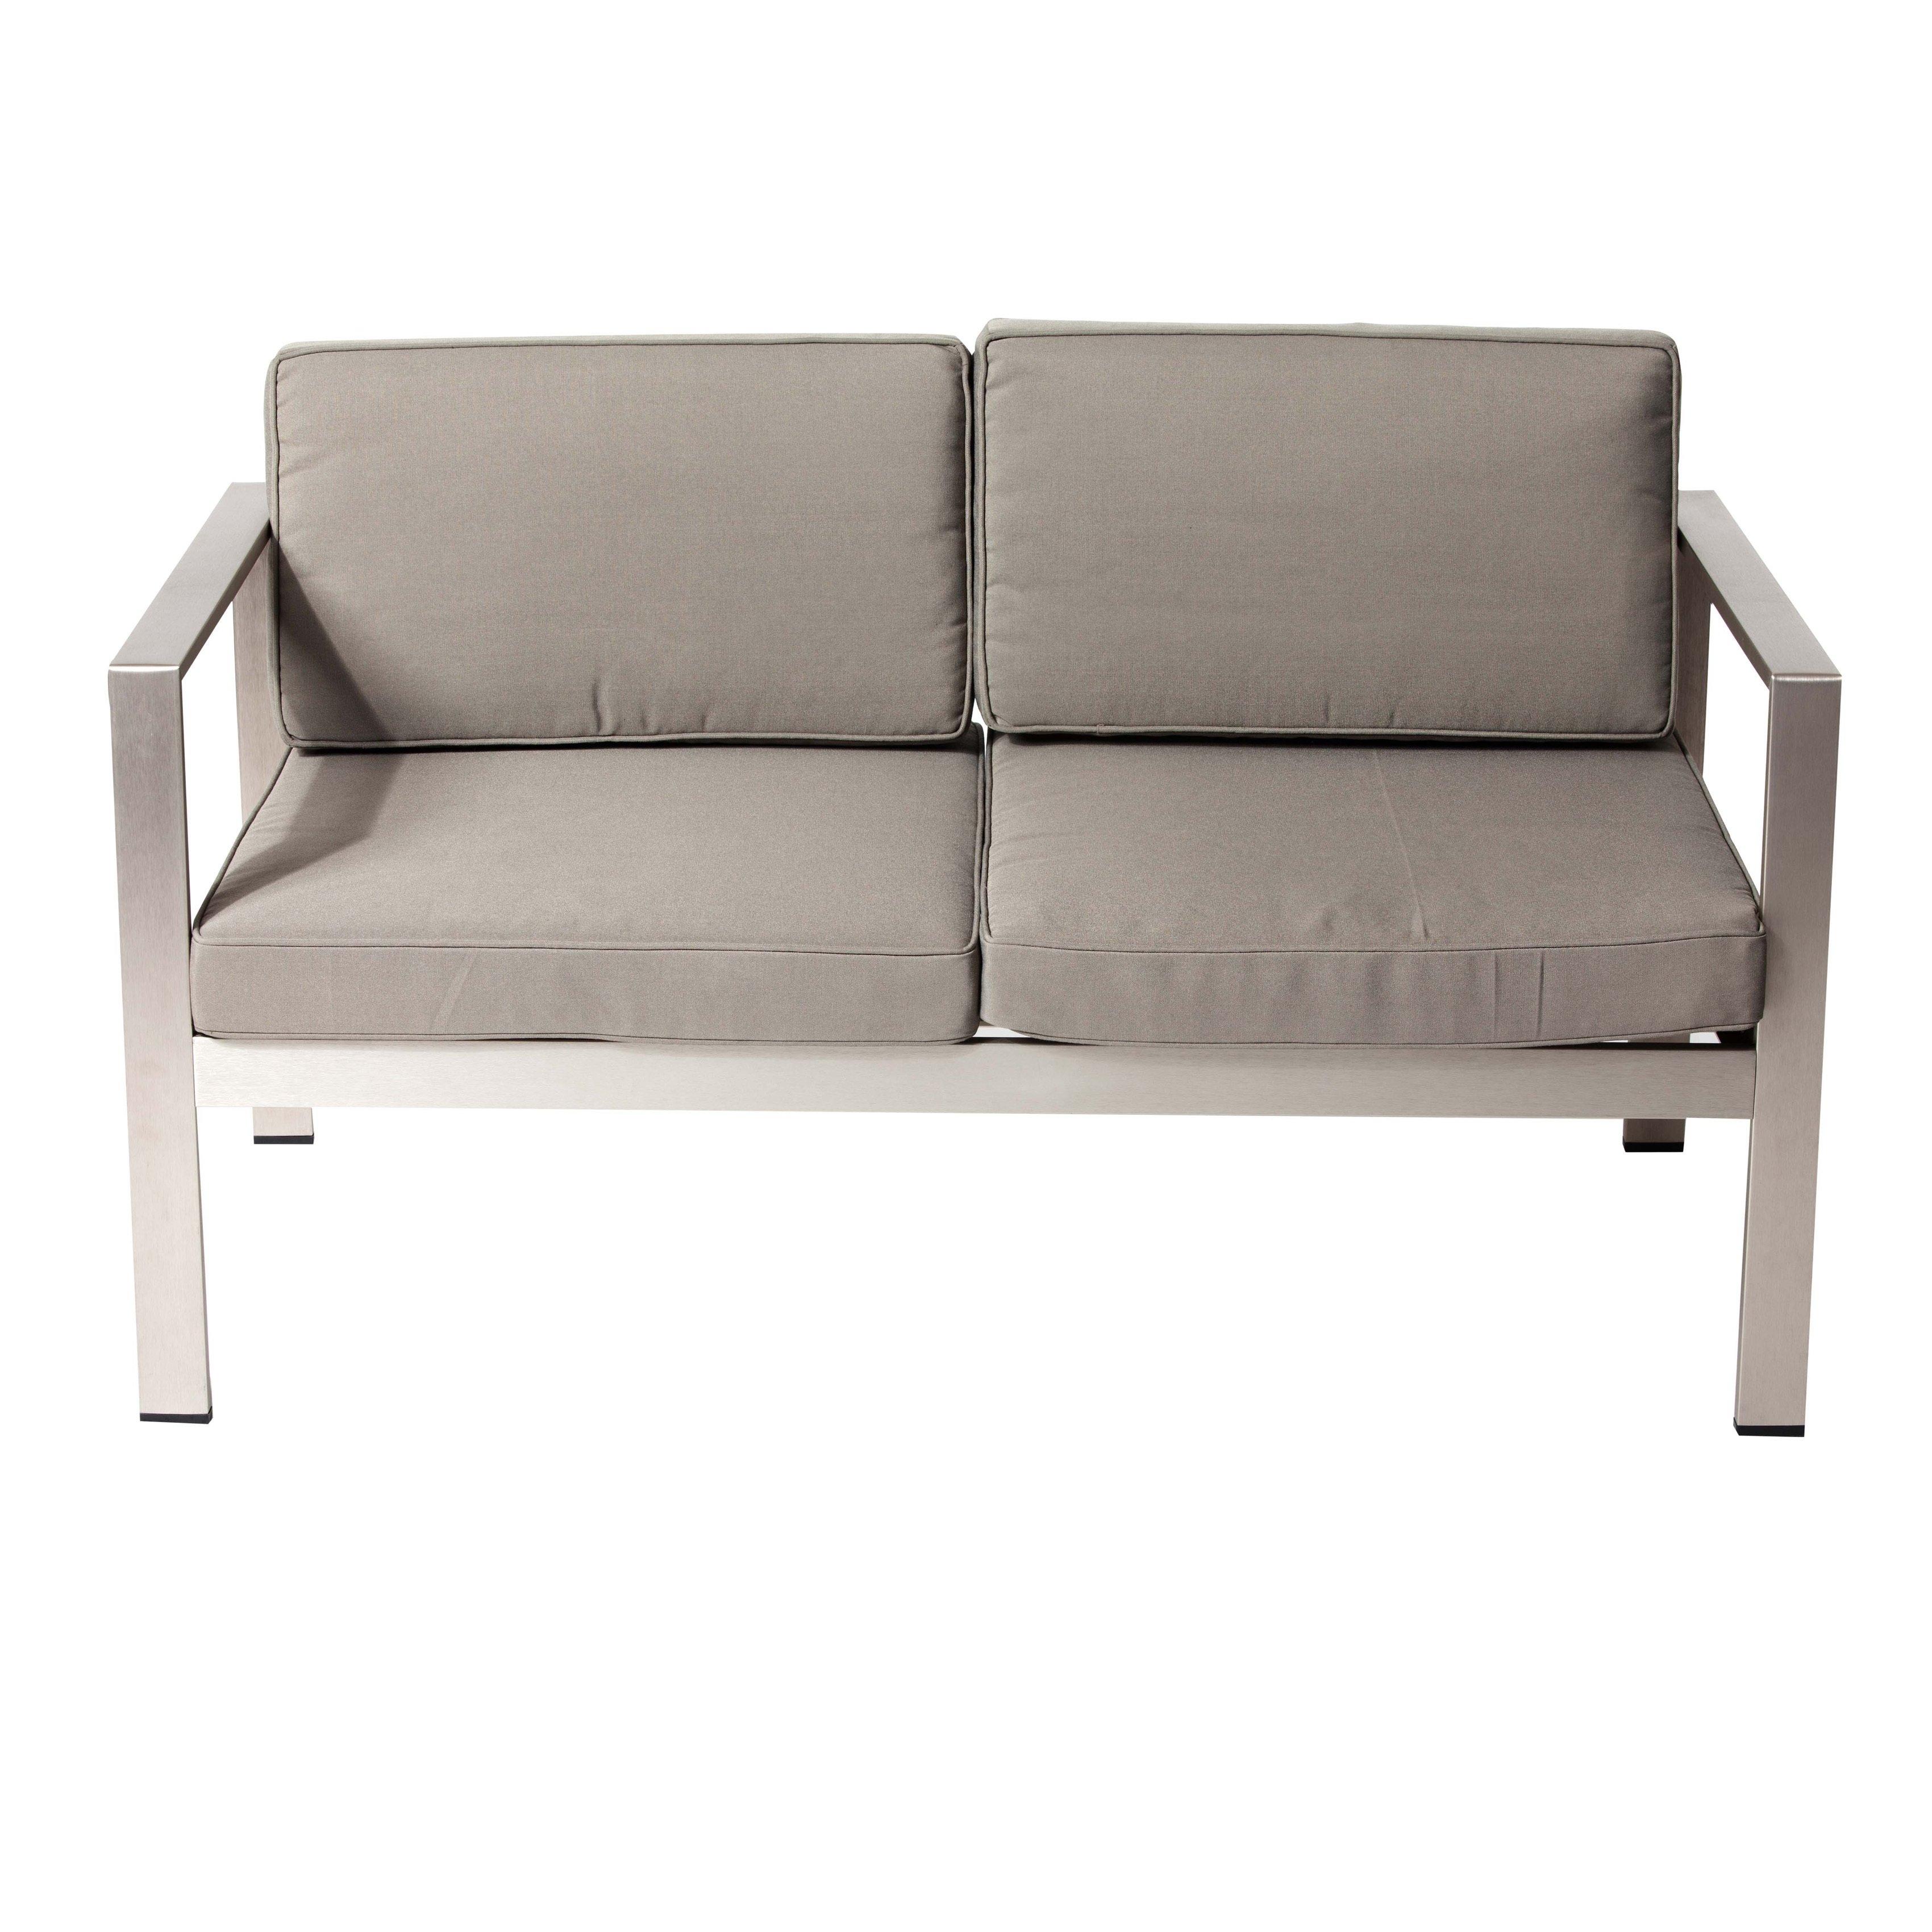 Shop Pangea Home Karen Sofa – On Sale – Free Shipping Today Regarding Karen 3 Piece Sectionals (Image 20 of 25)